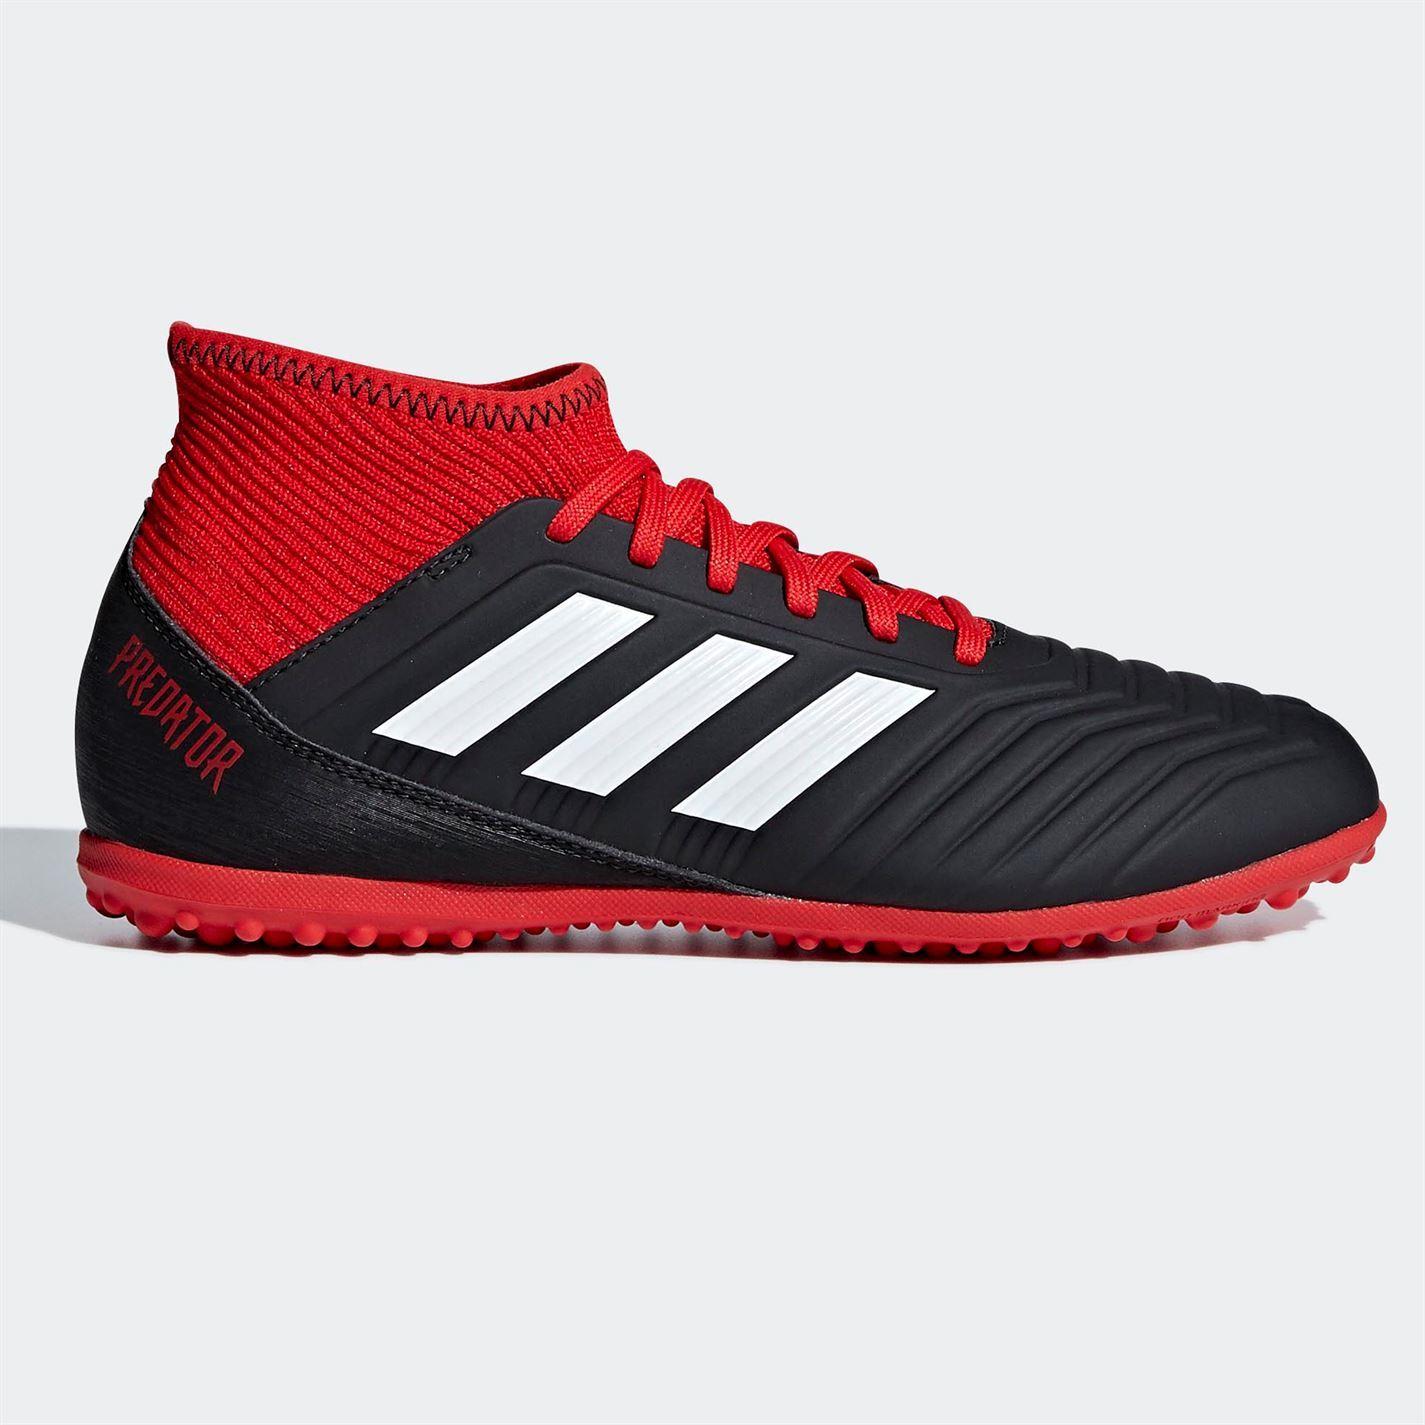 b9f9e9c8cd6 ... adidas Predator Tango 18.3 Astro Turf Football Trainers Childs Soccer  Shoes